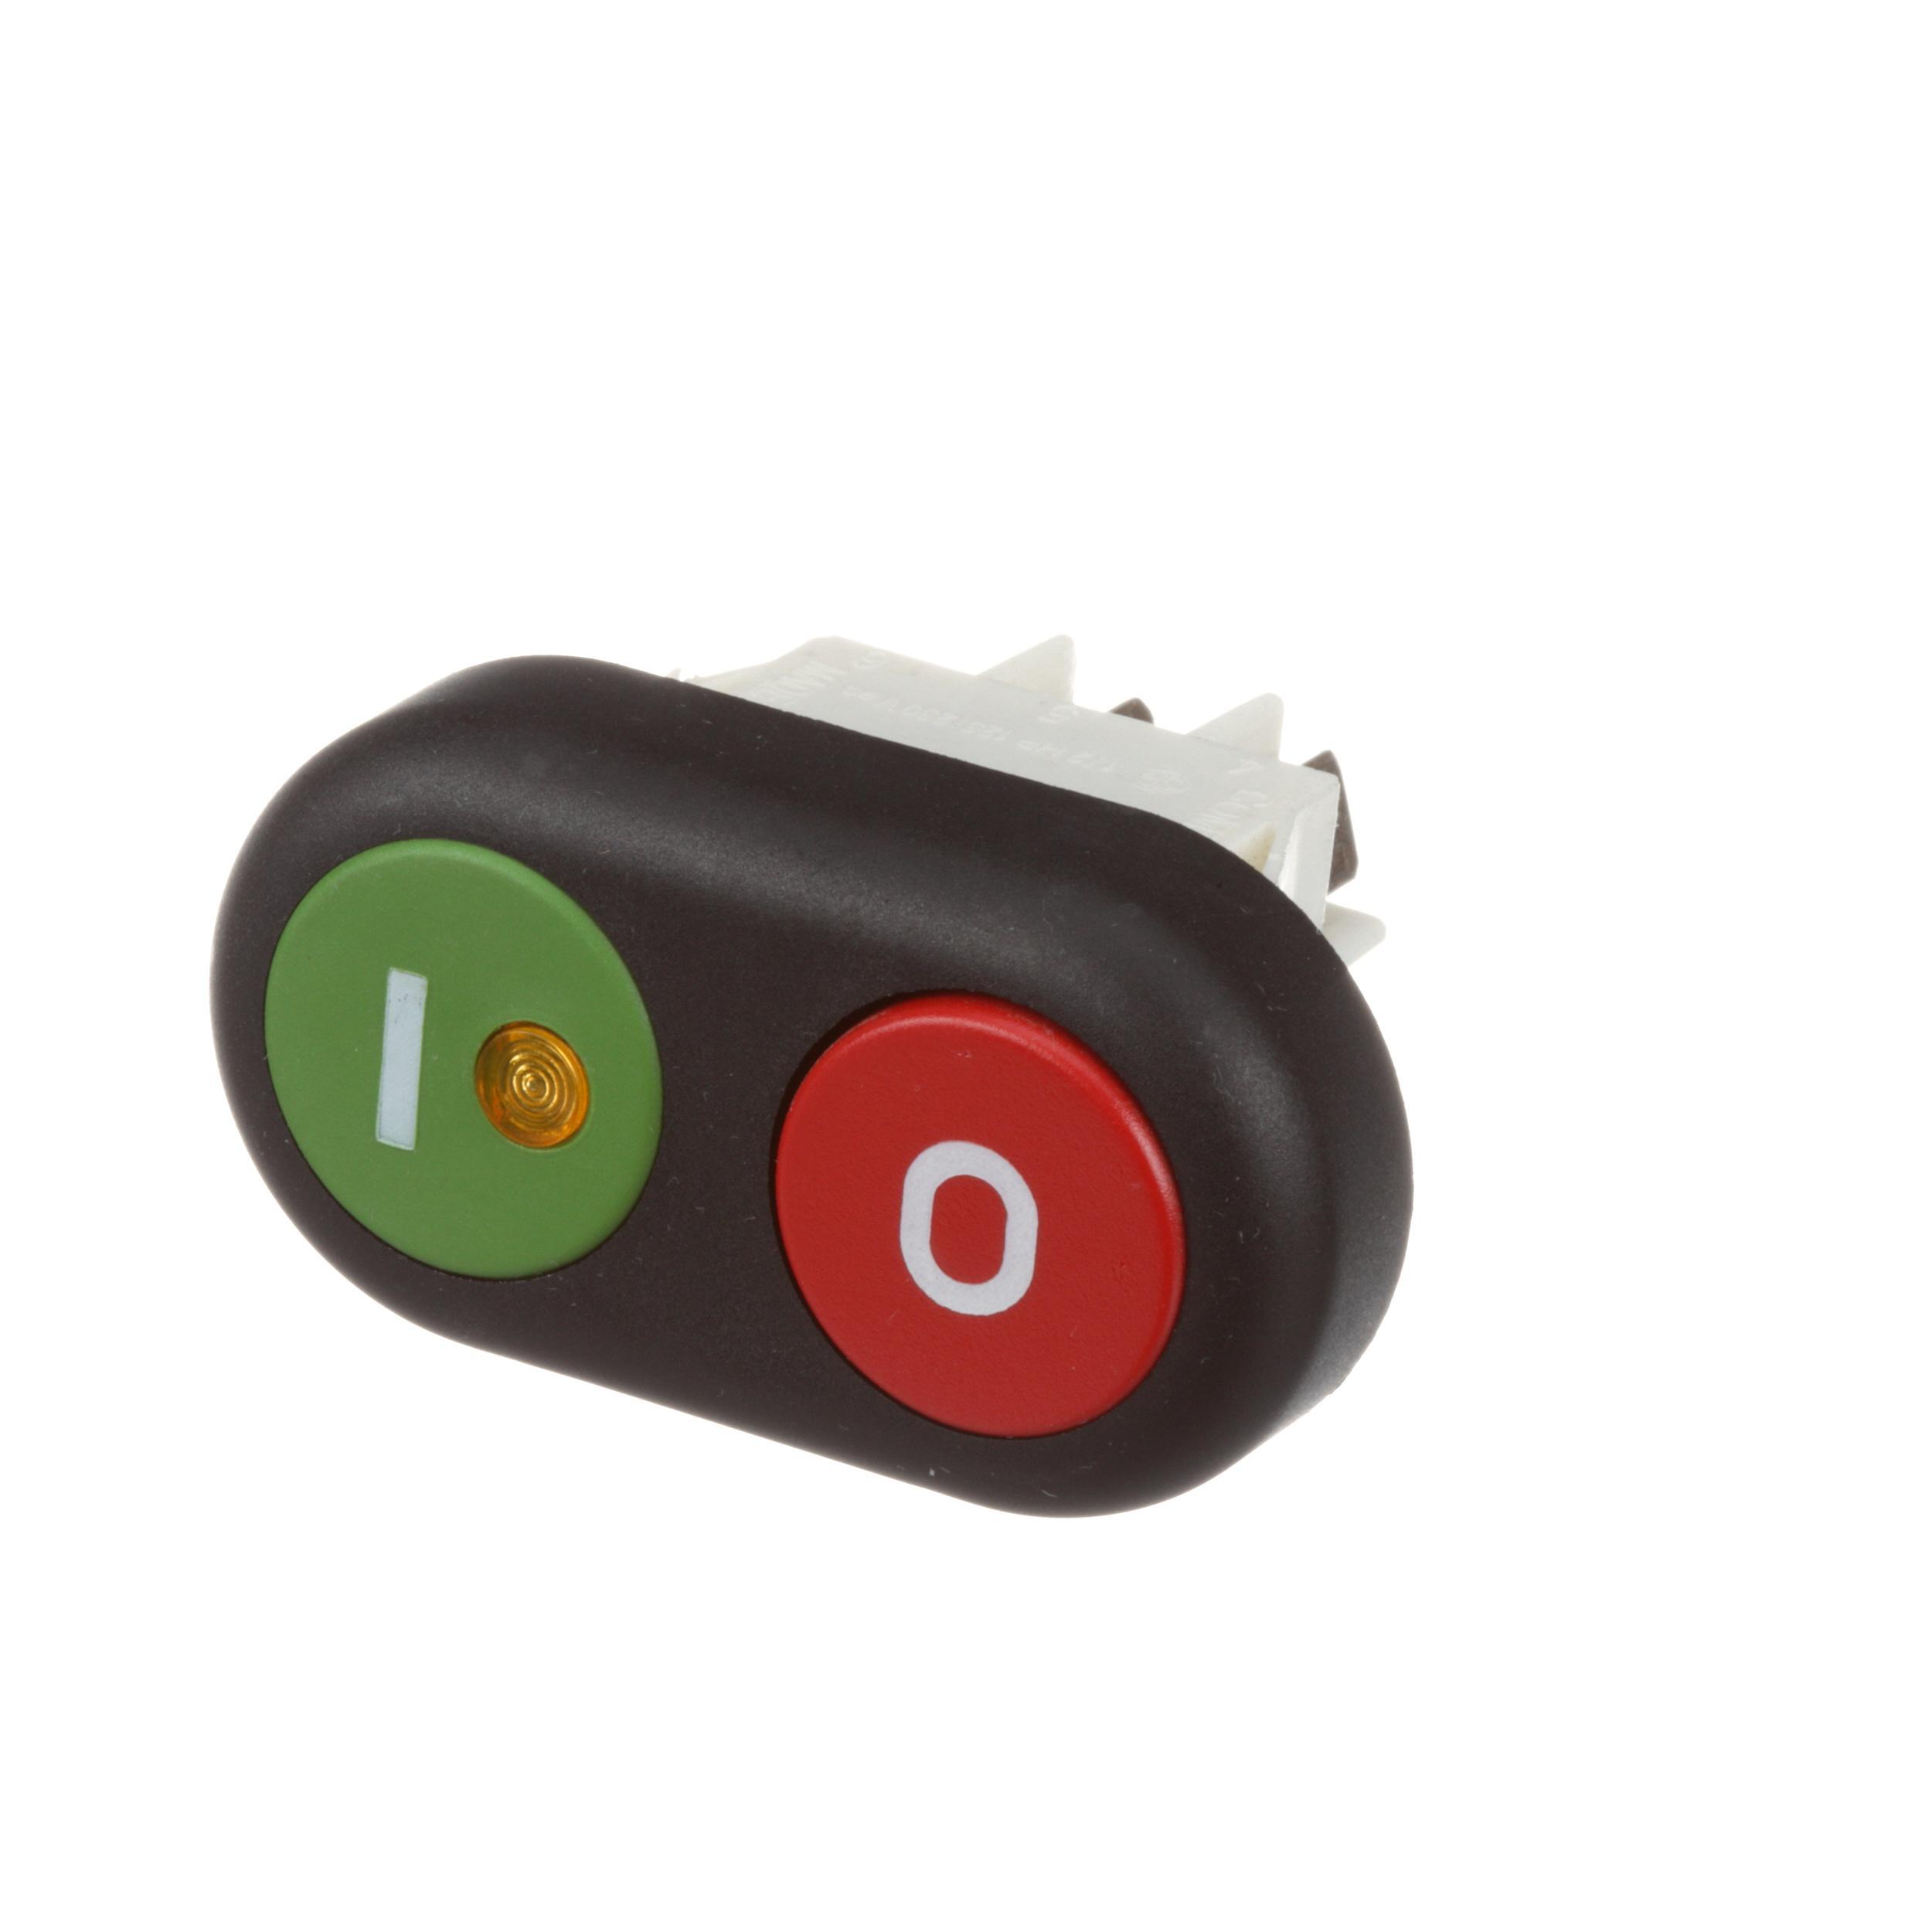 globe push button power switch part et28 1. Black Bedroom Furniture Sets. Home Design Ideas